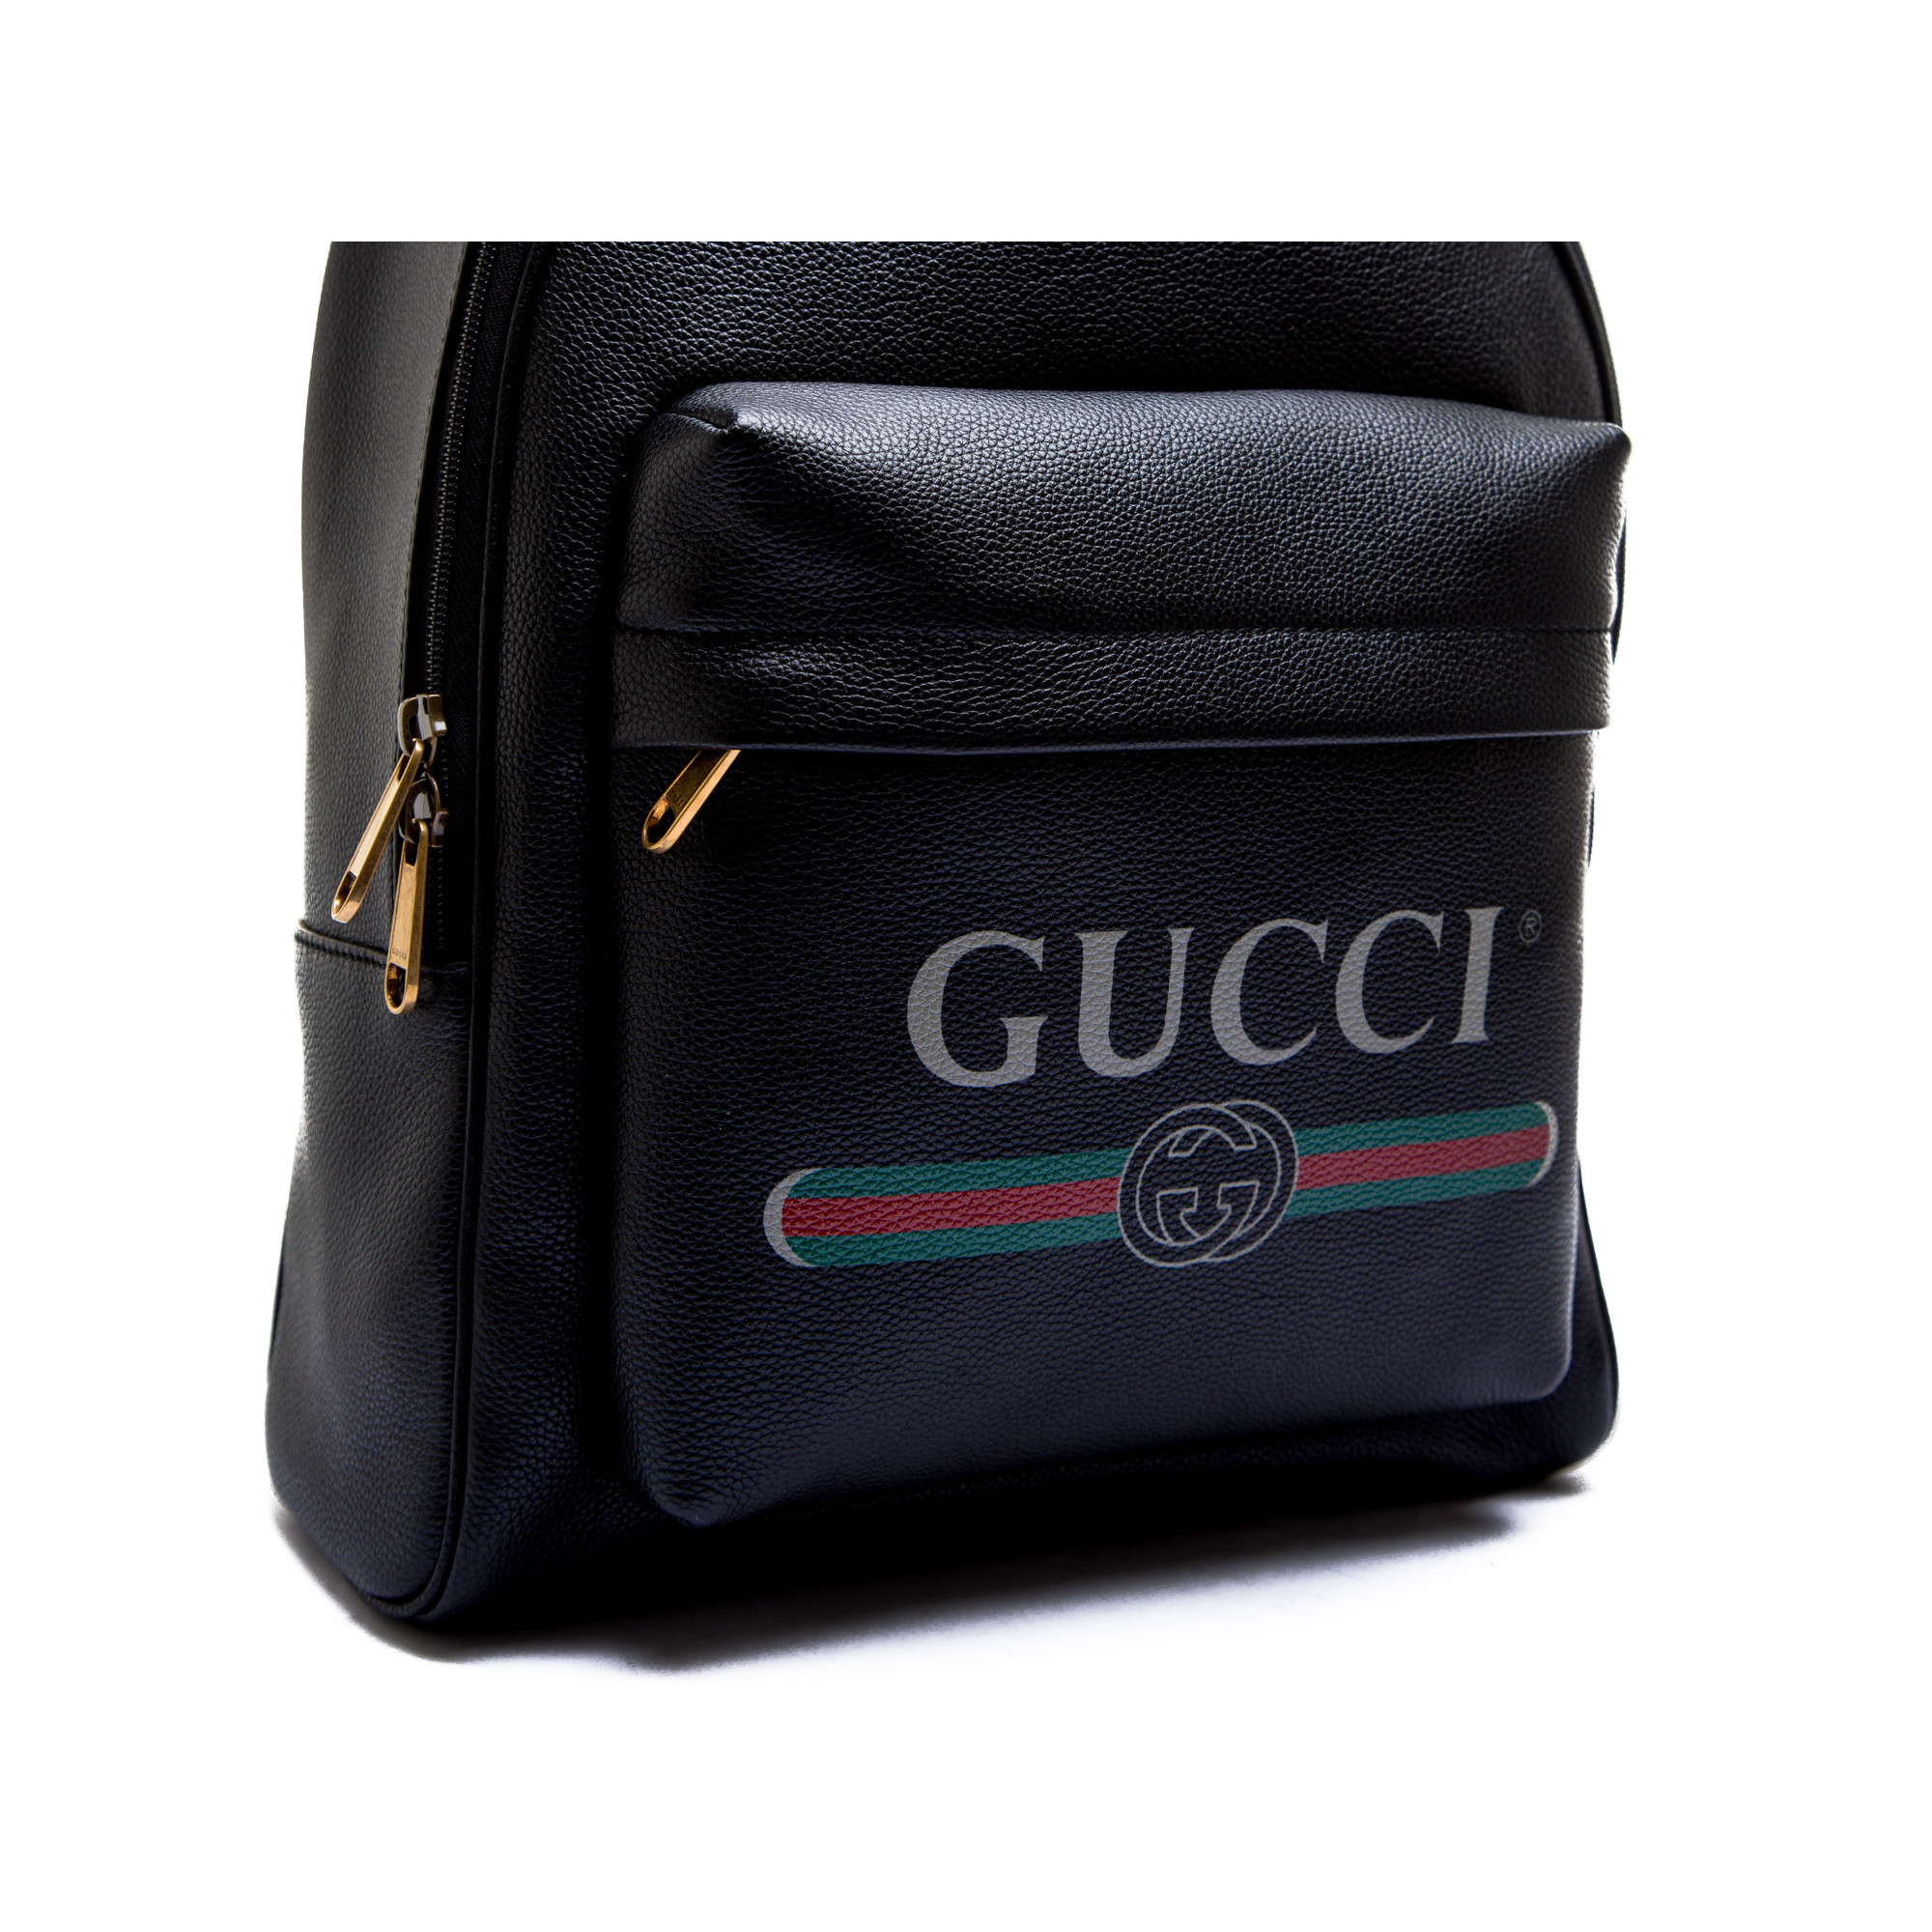 c2d5447b16f768 ... Gucci backpack Gucci backpack - www.derodeloper.com - Derodeloper.com